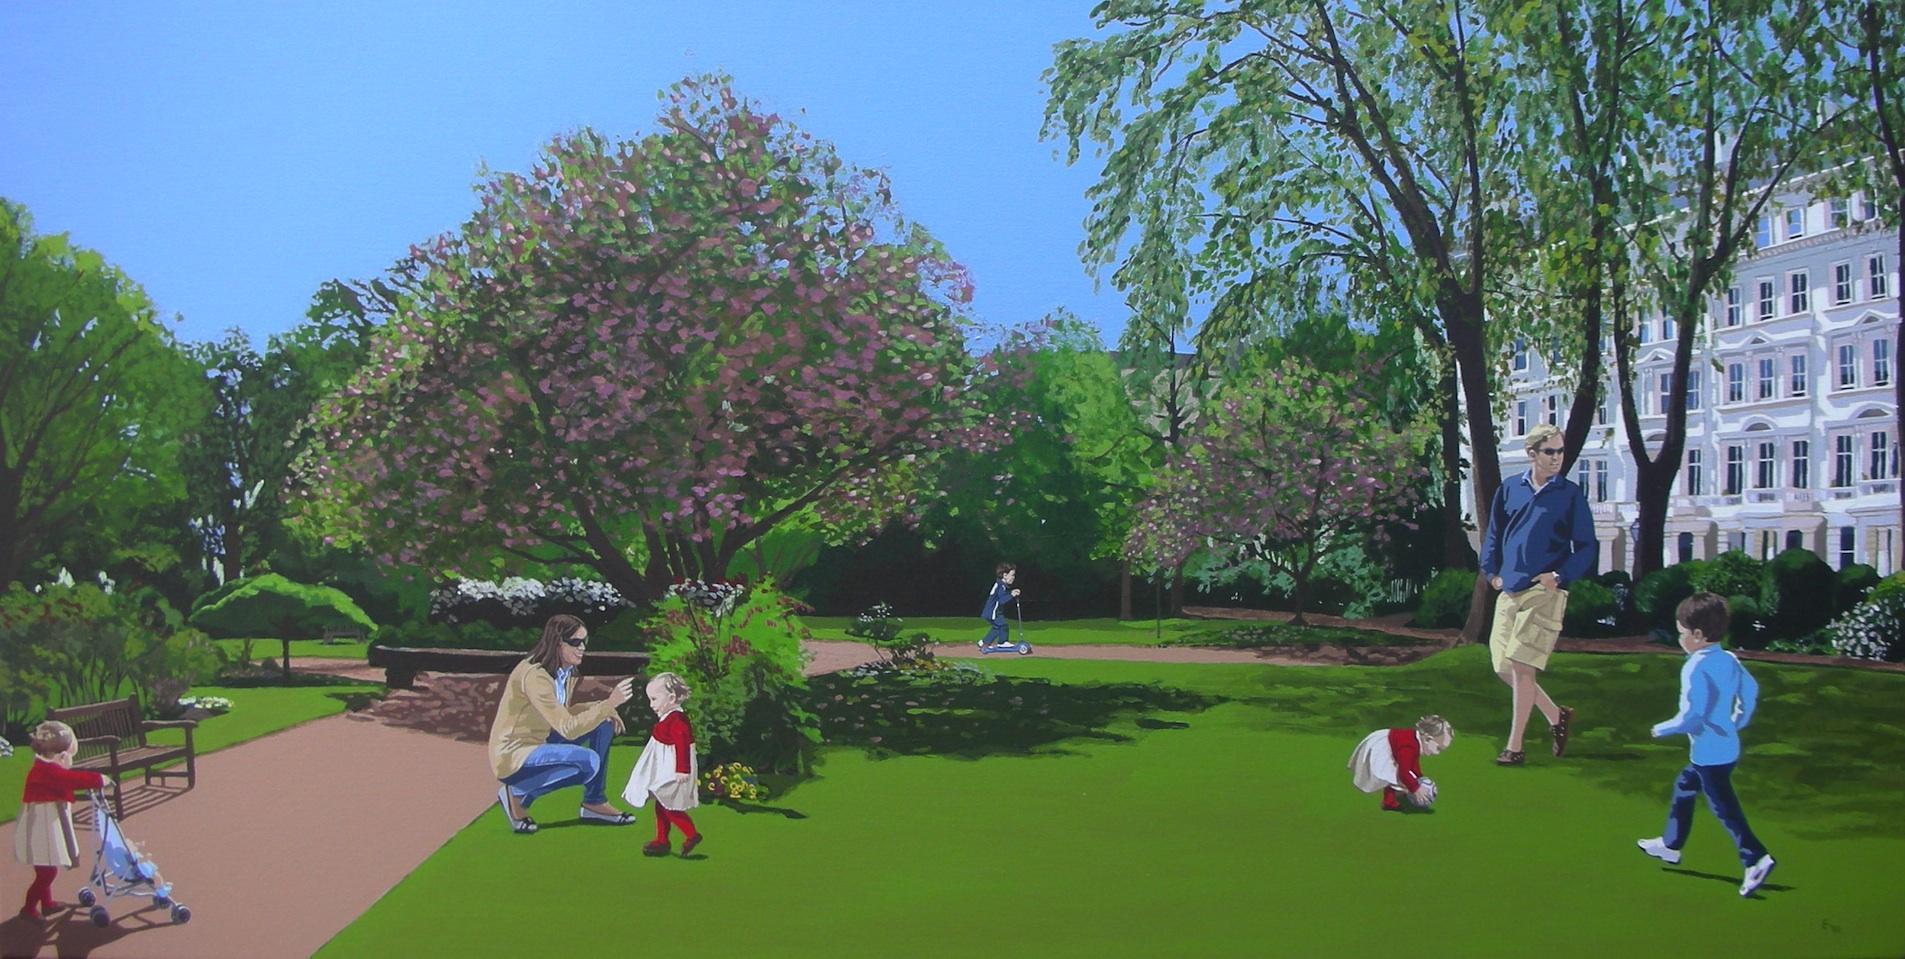 Stanhope Gardens 2009